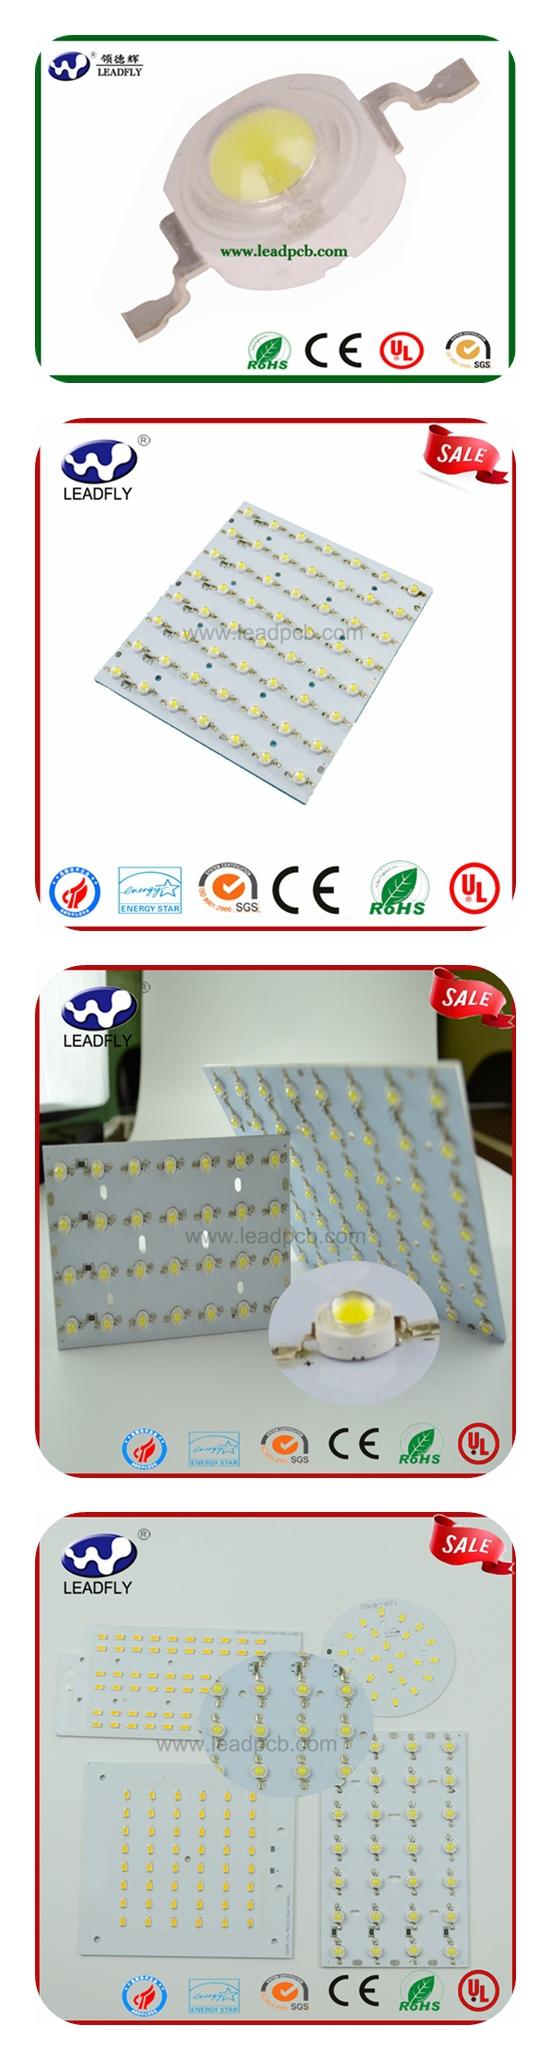 Newest Design Circuitpcb Assemblied Ssc5630 Chip Alu Tube 94v0 Pcb Led Circuit T5 T8